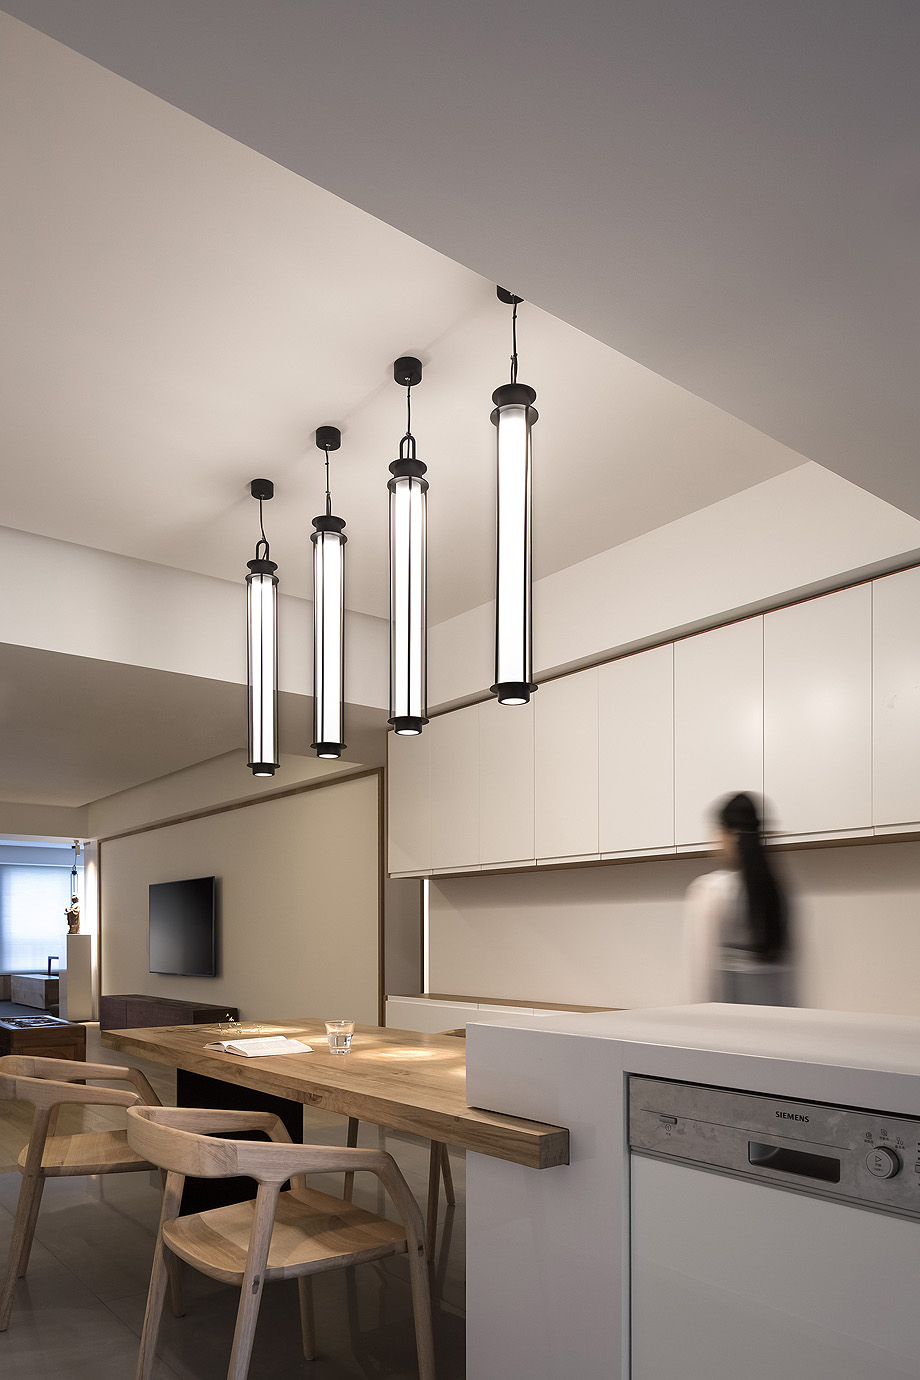 vivienda de ad architecture - foto ouyang yun (16)